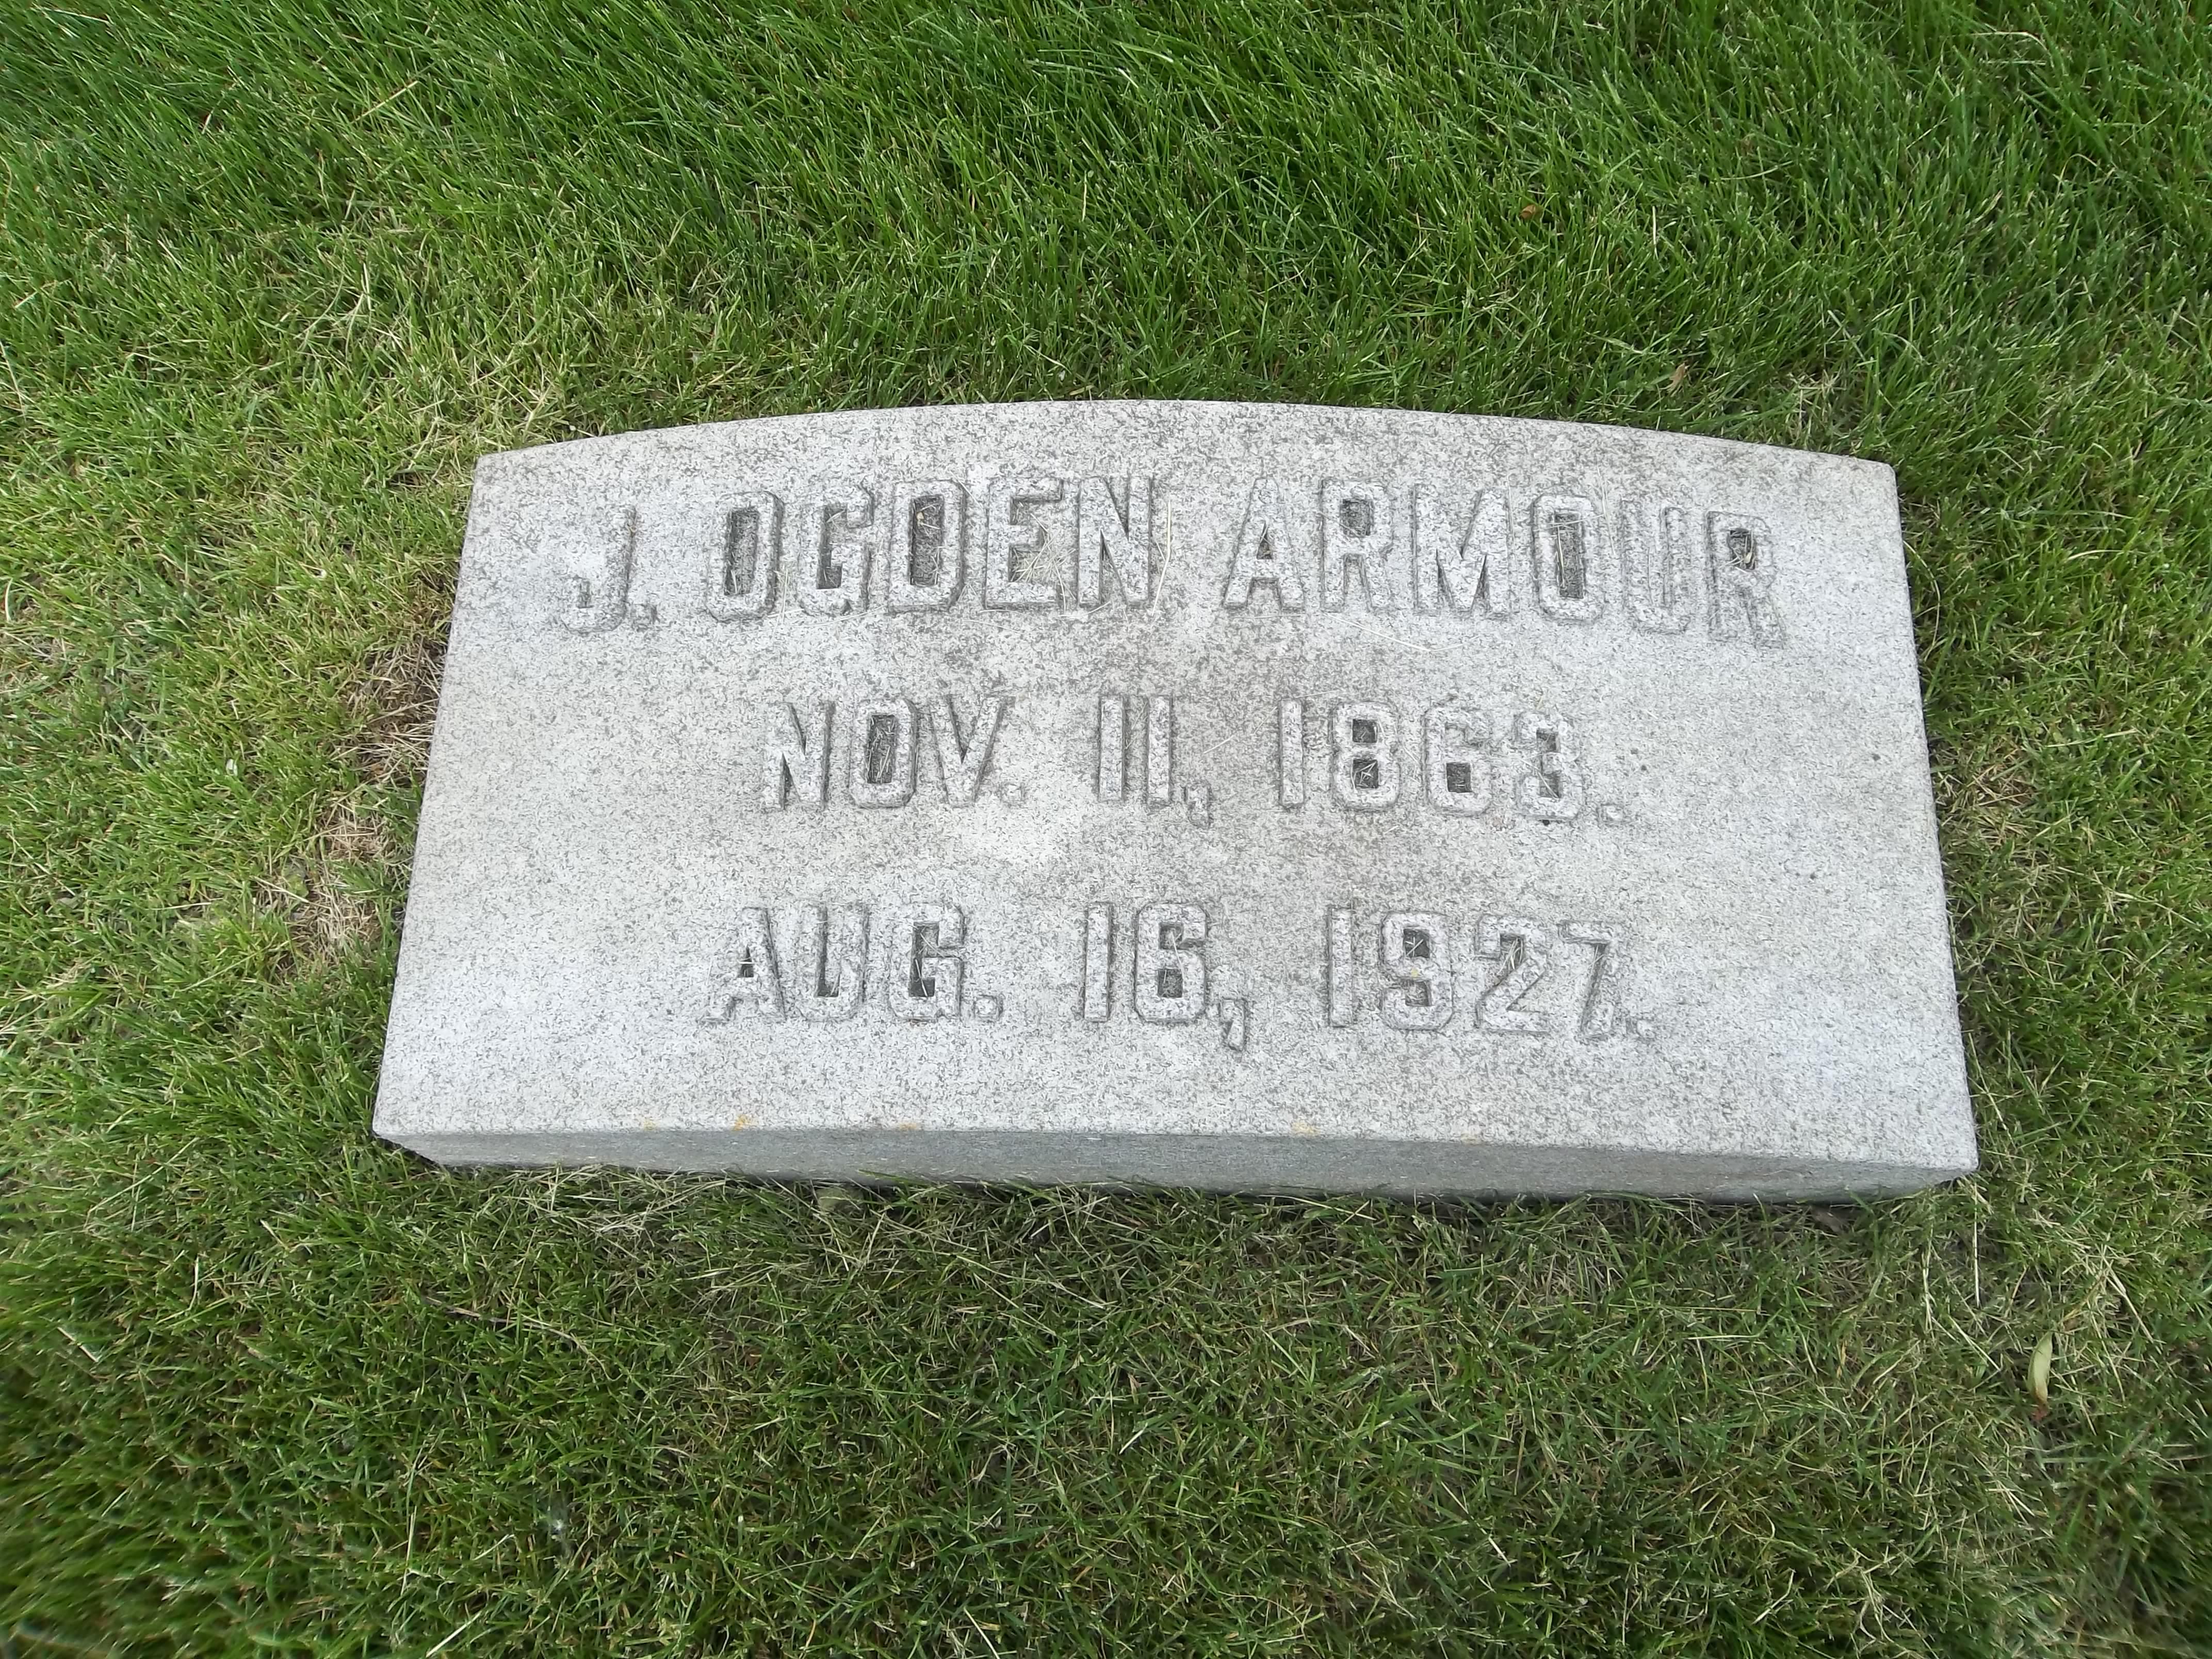 Jonathan Ogden Armour